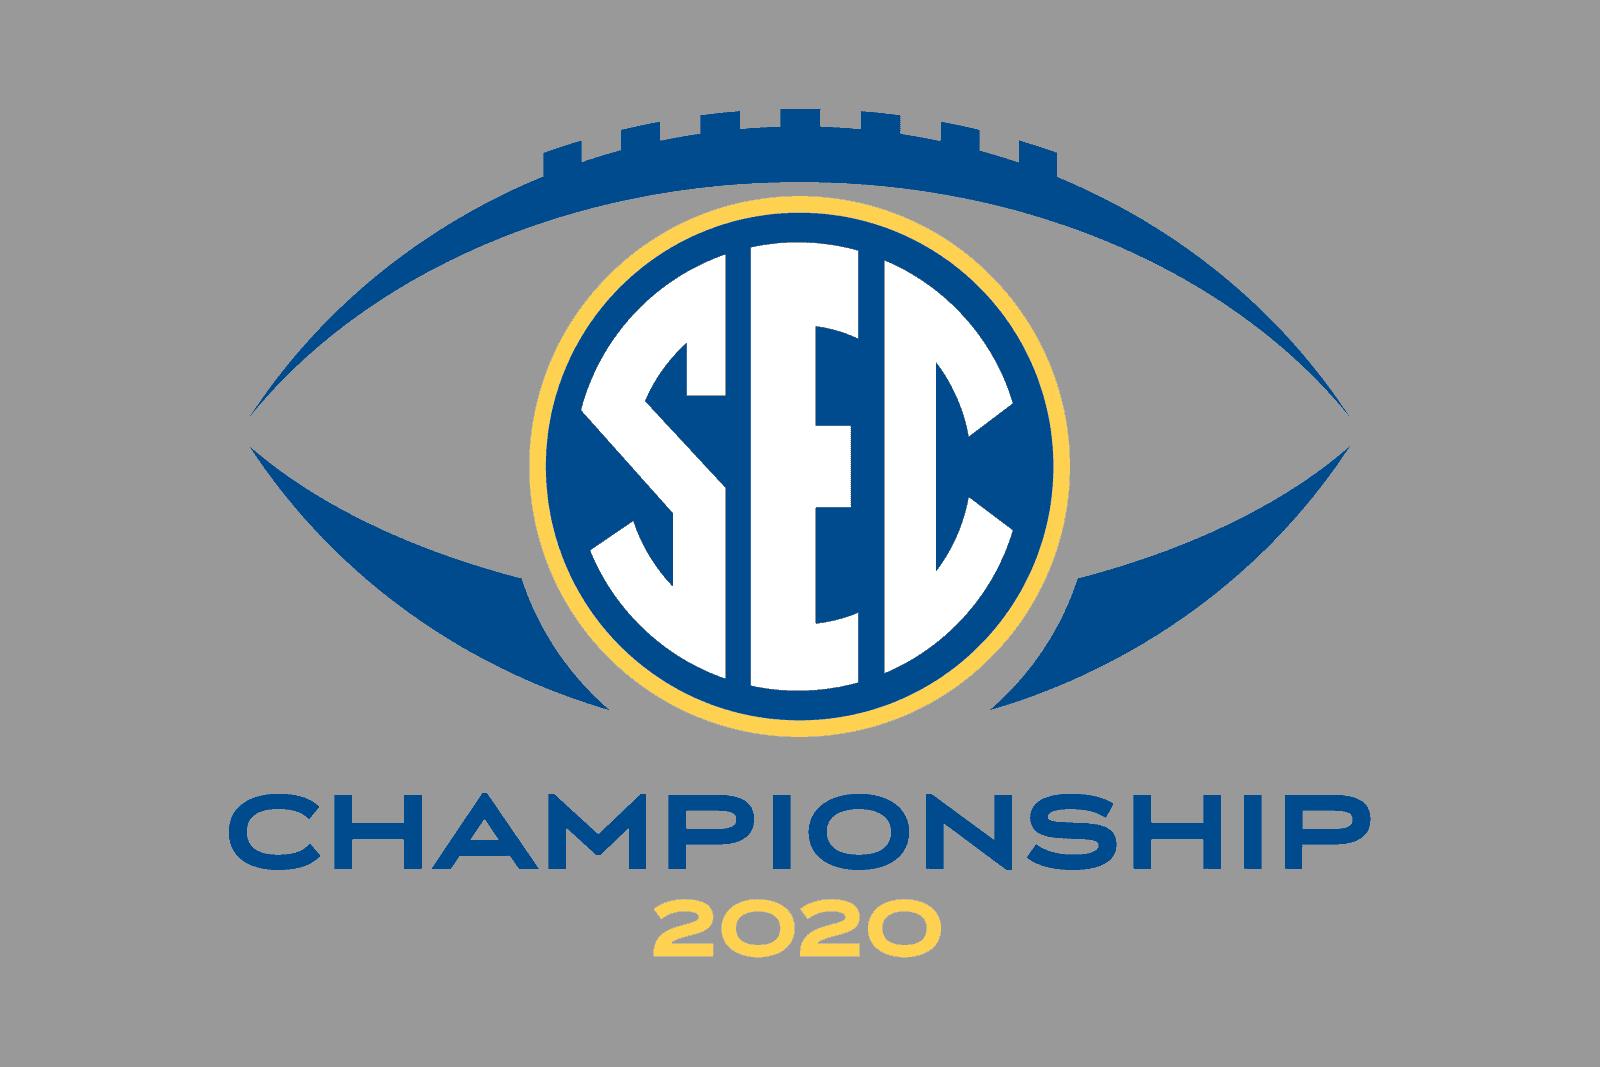 2020 SEC Championship Game